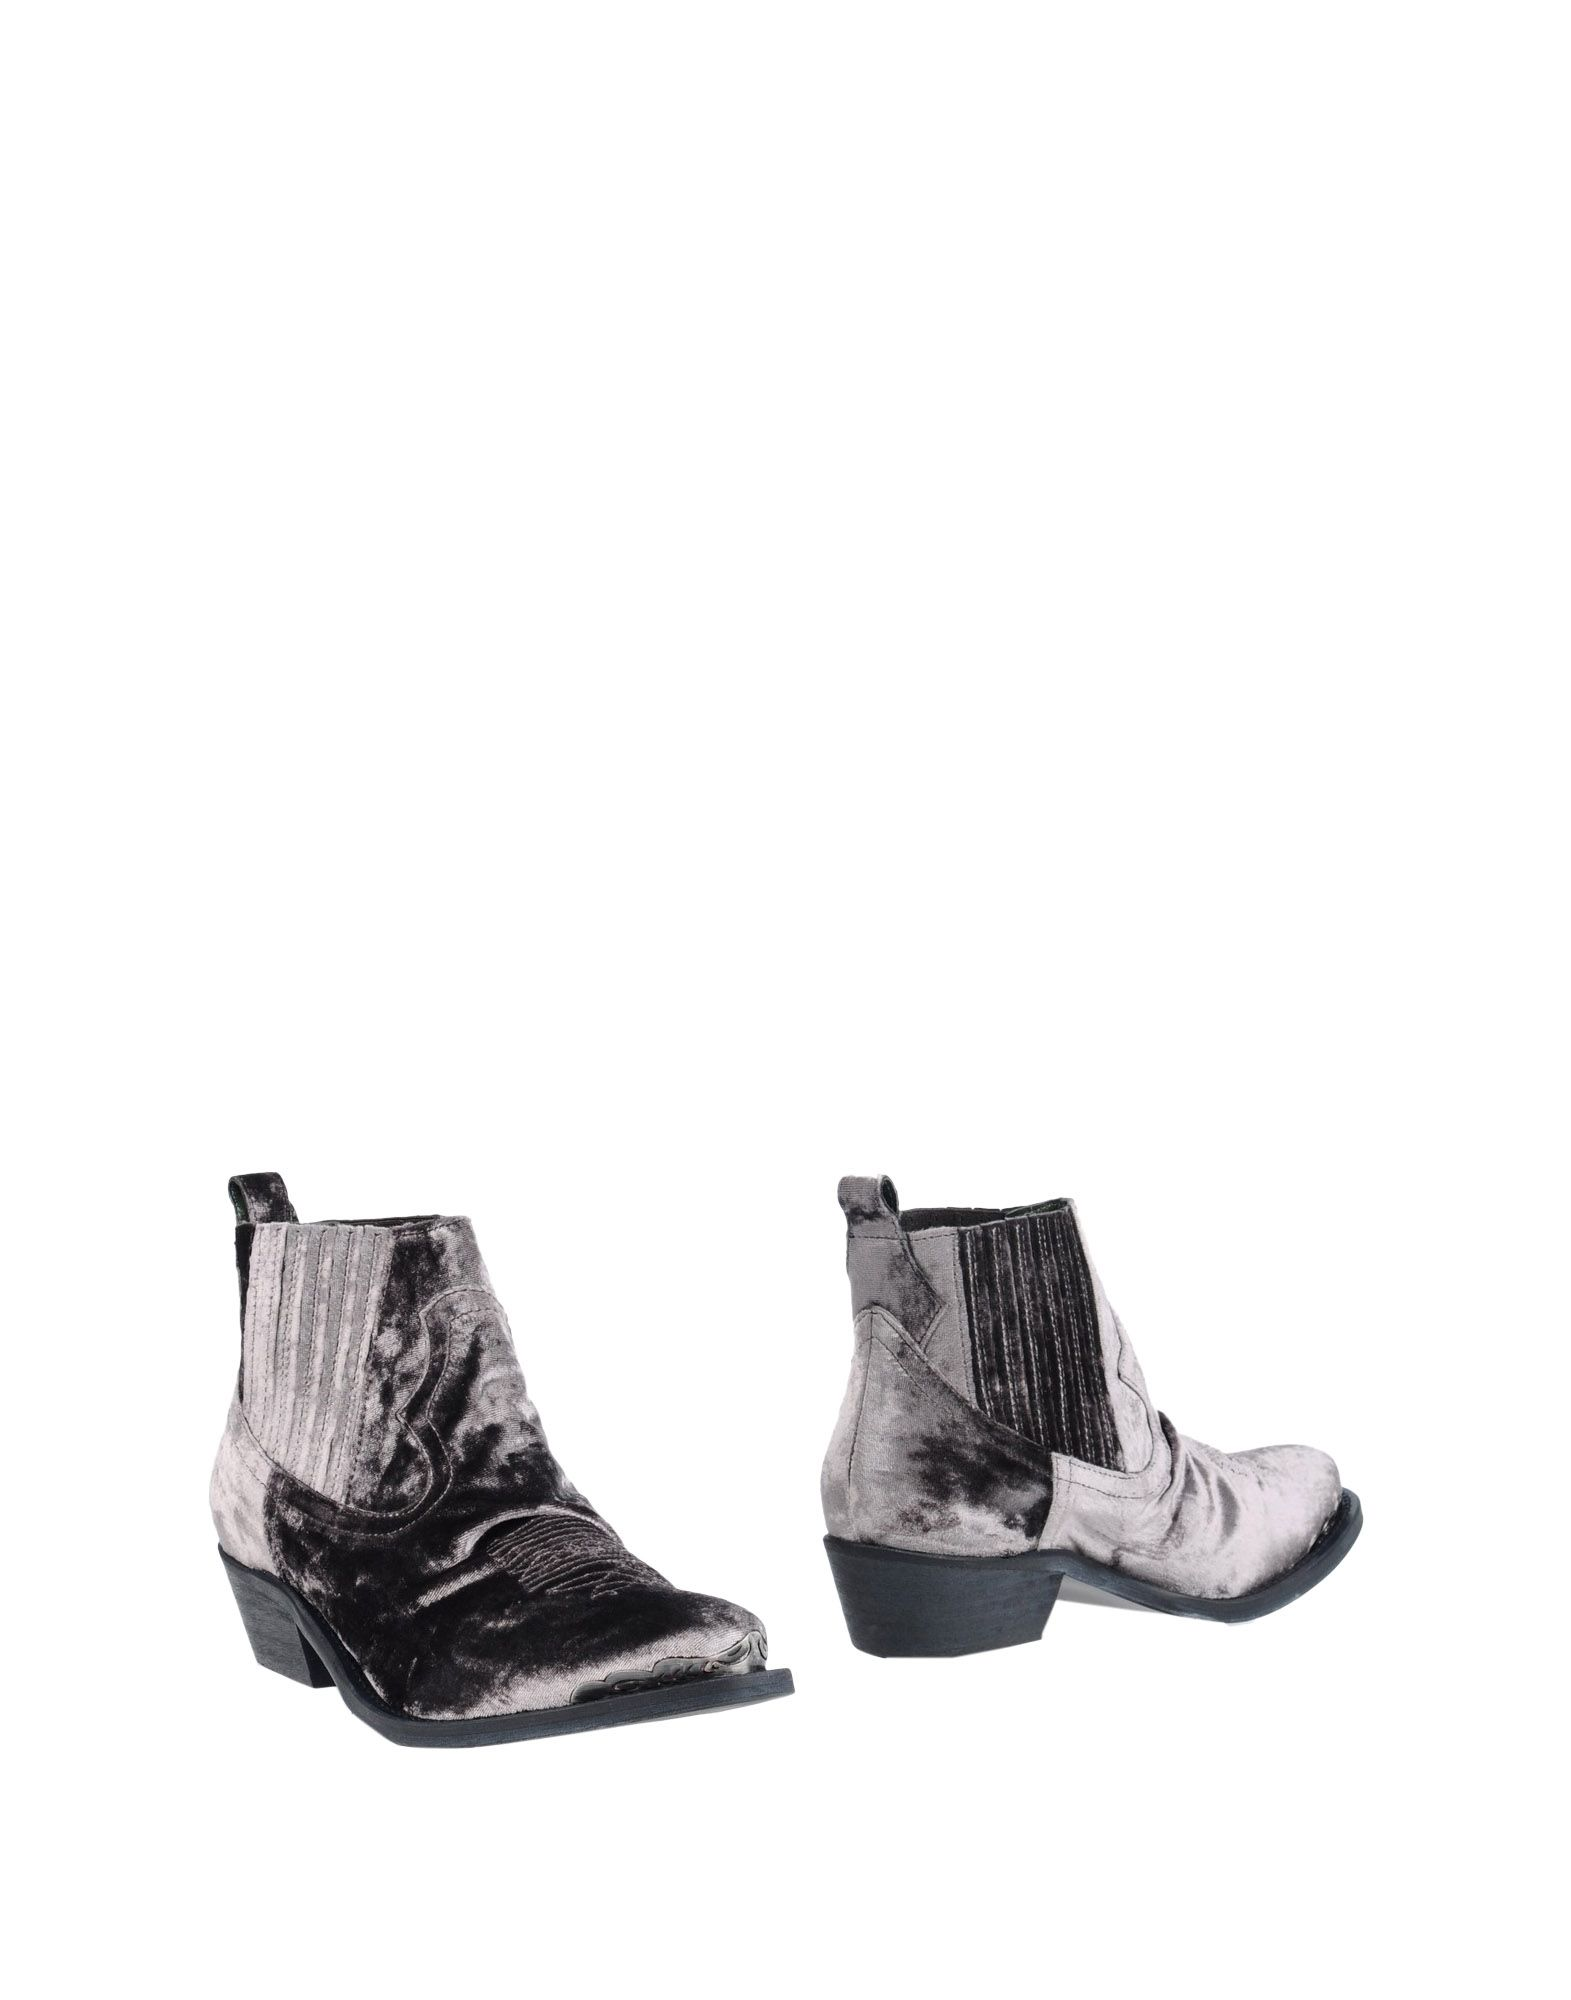 Gut G um billige Schuhe zu tragenG Di G Gut Stiefelette Damen  11263120LI c30bf1